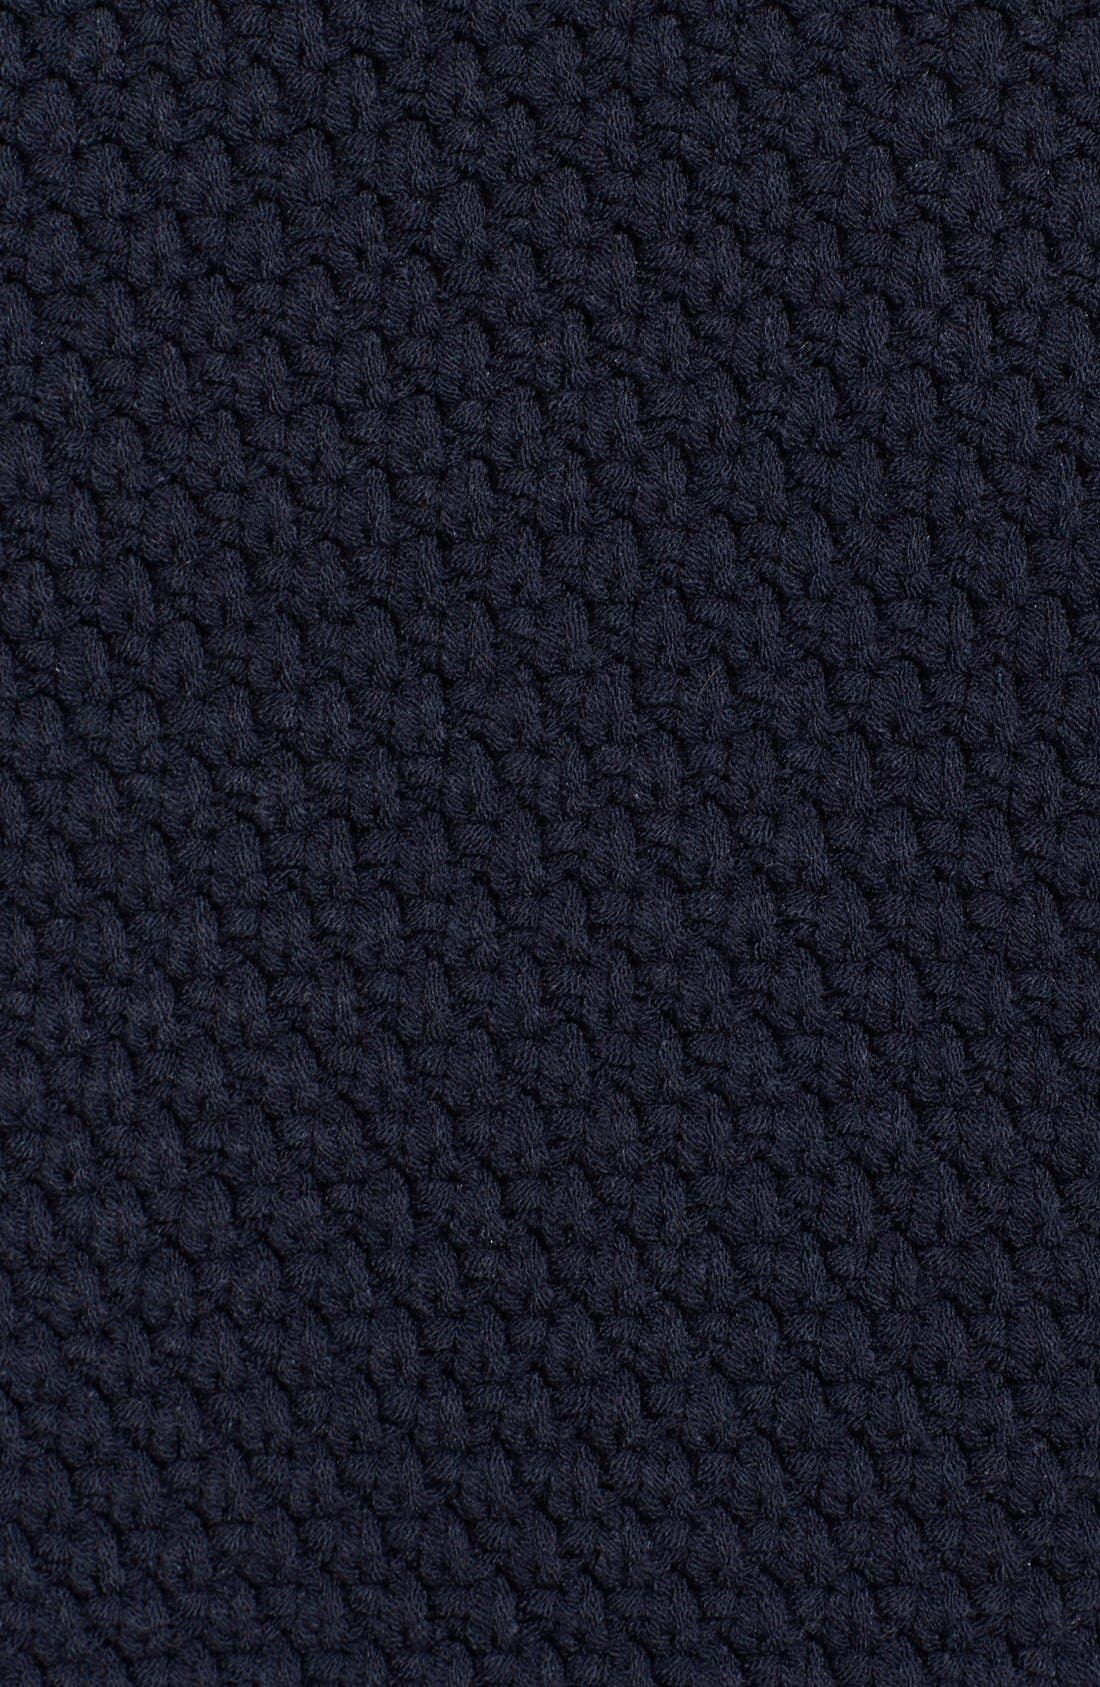 Shawl Collar Sweater,                             Alternate thumbnail 5, color,                             020